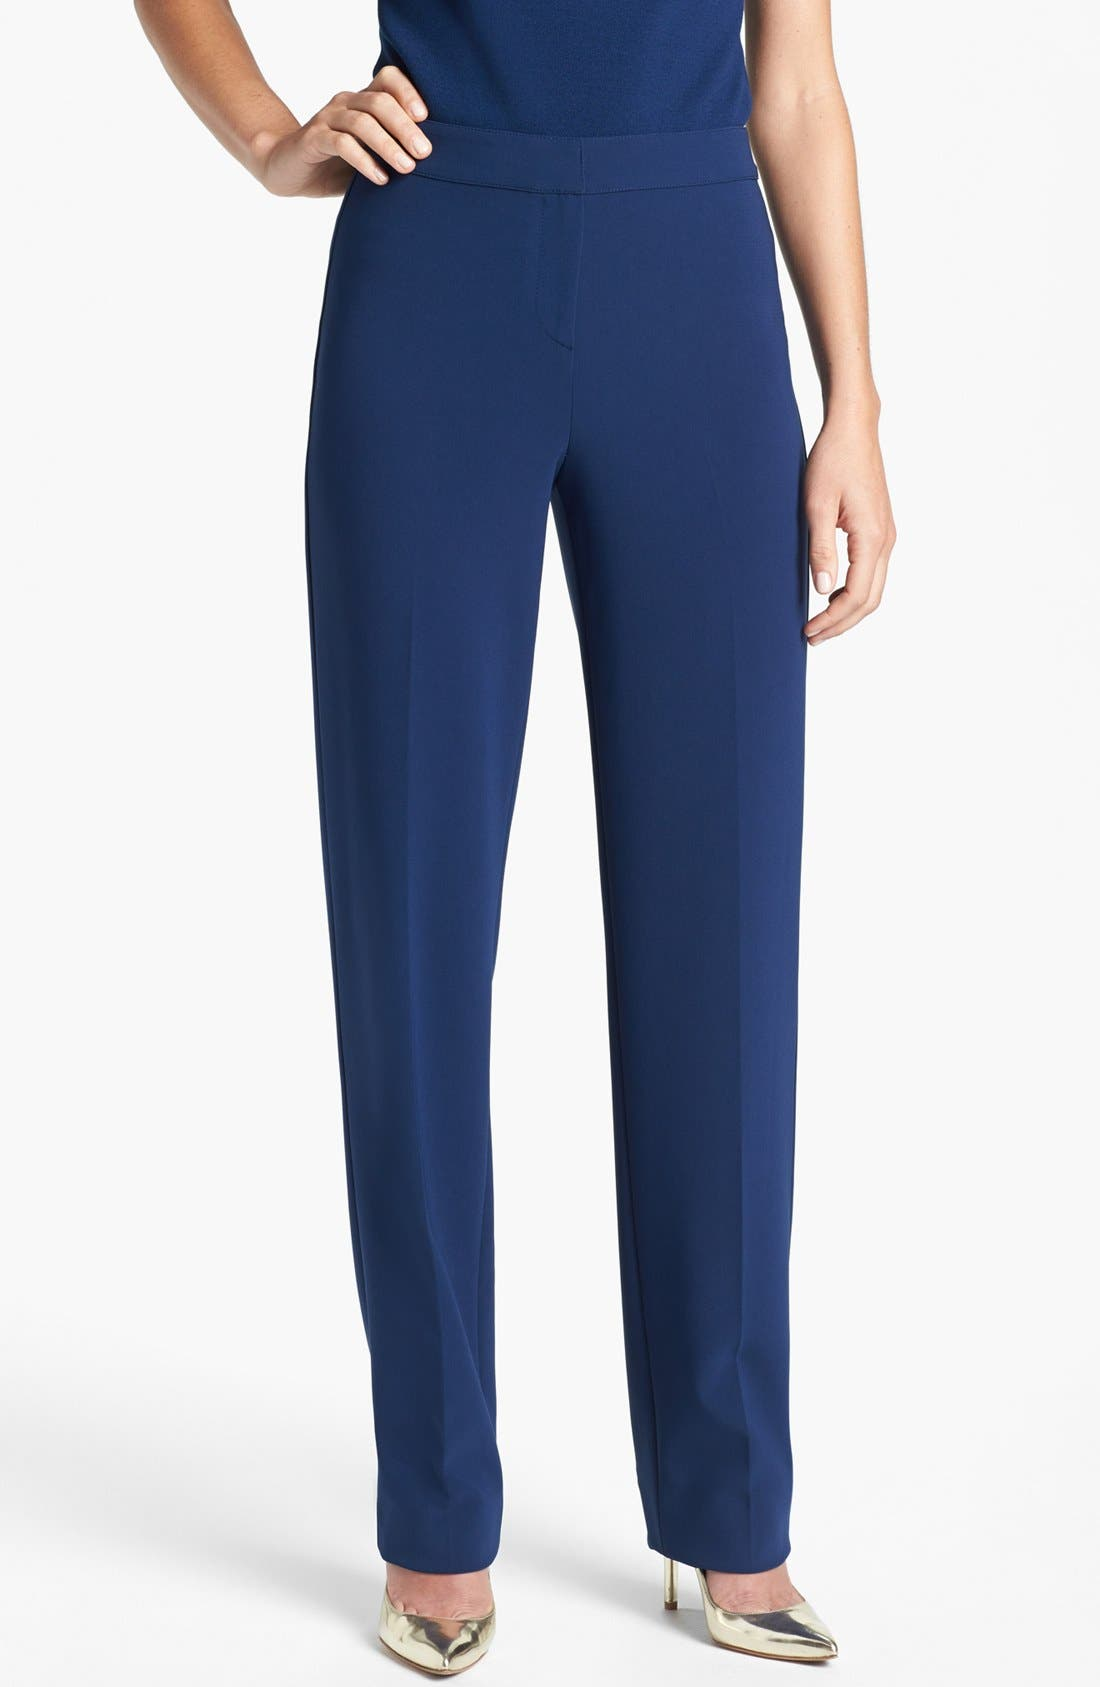 Alternate Image 1 Selected - St. John Collection 'Diana' Straight Leg Crepe Marocain Pants